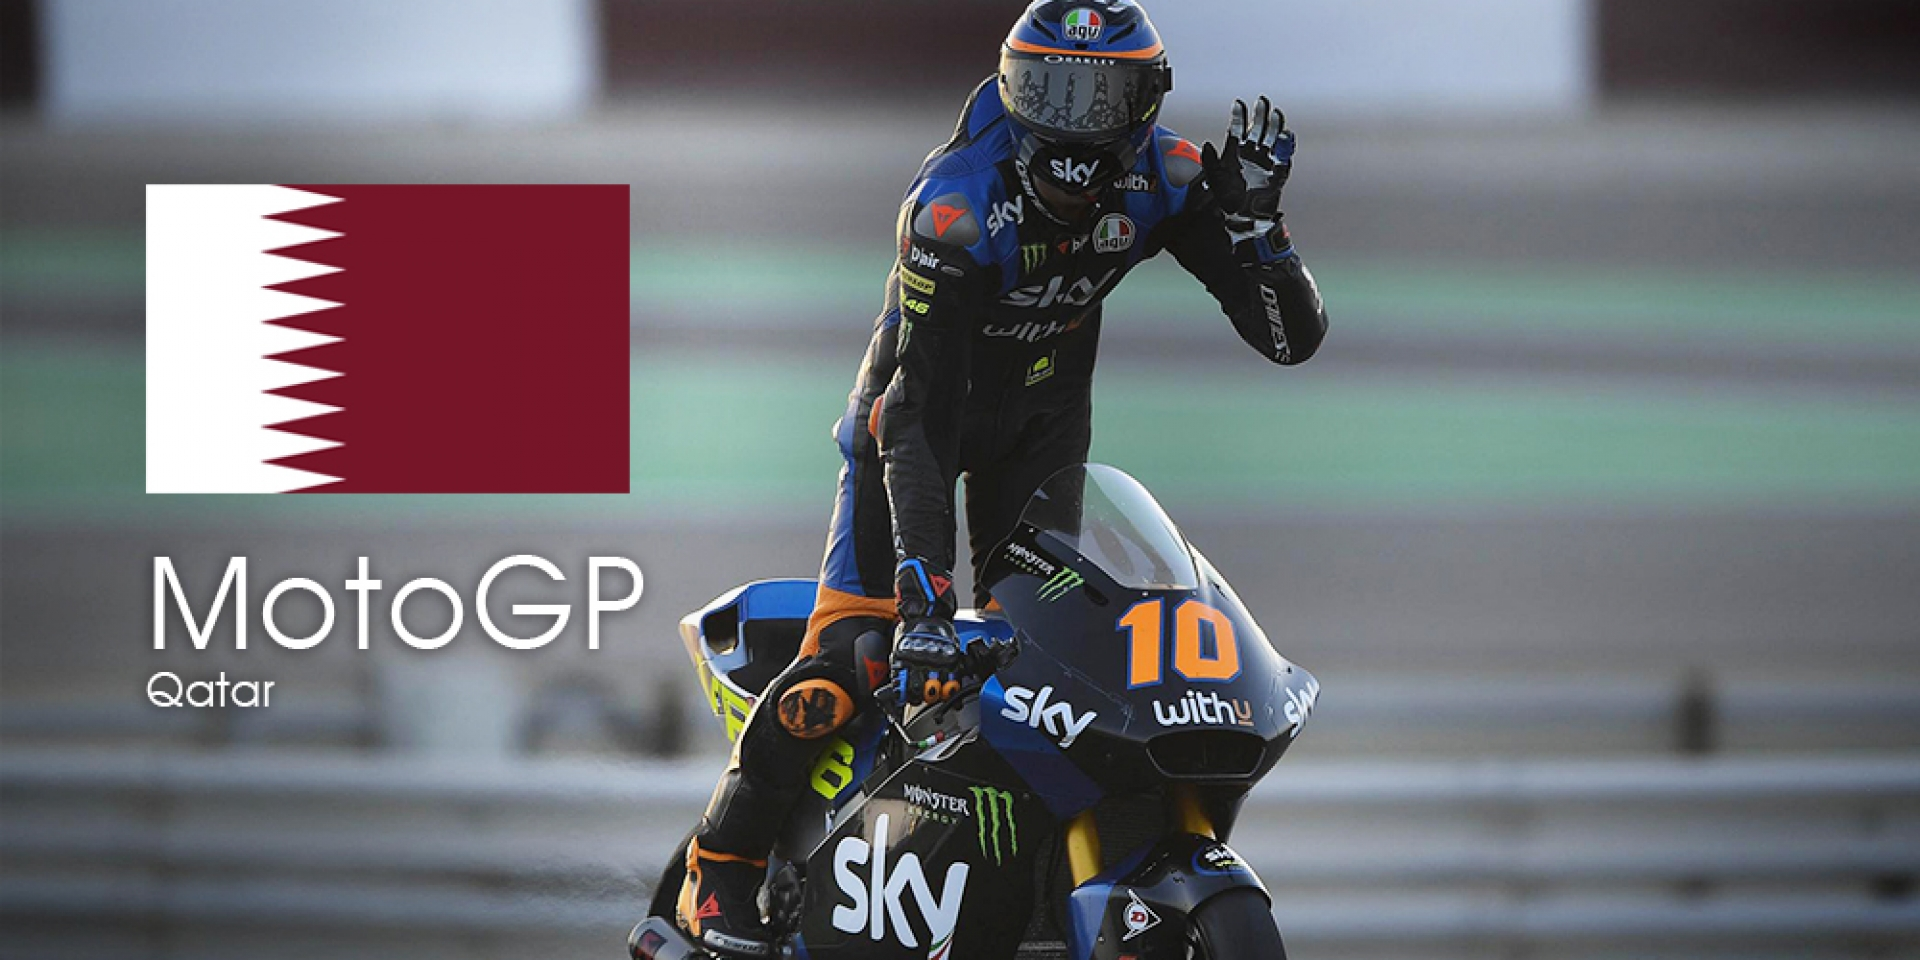 MotoGP 2020 卡達站 轉播時間